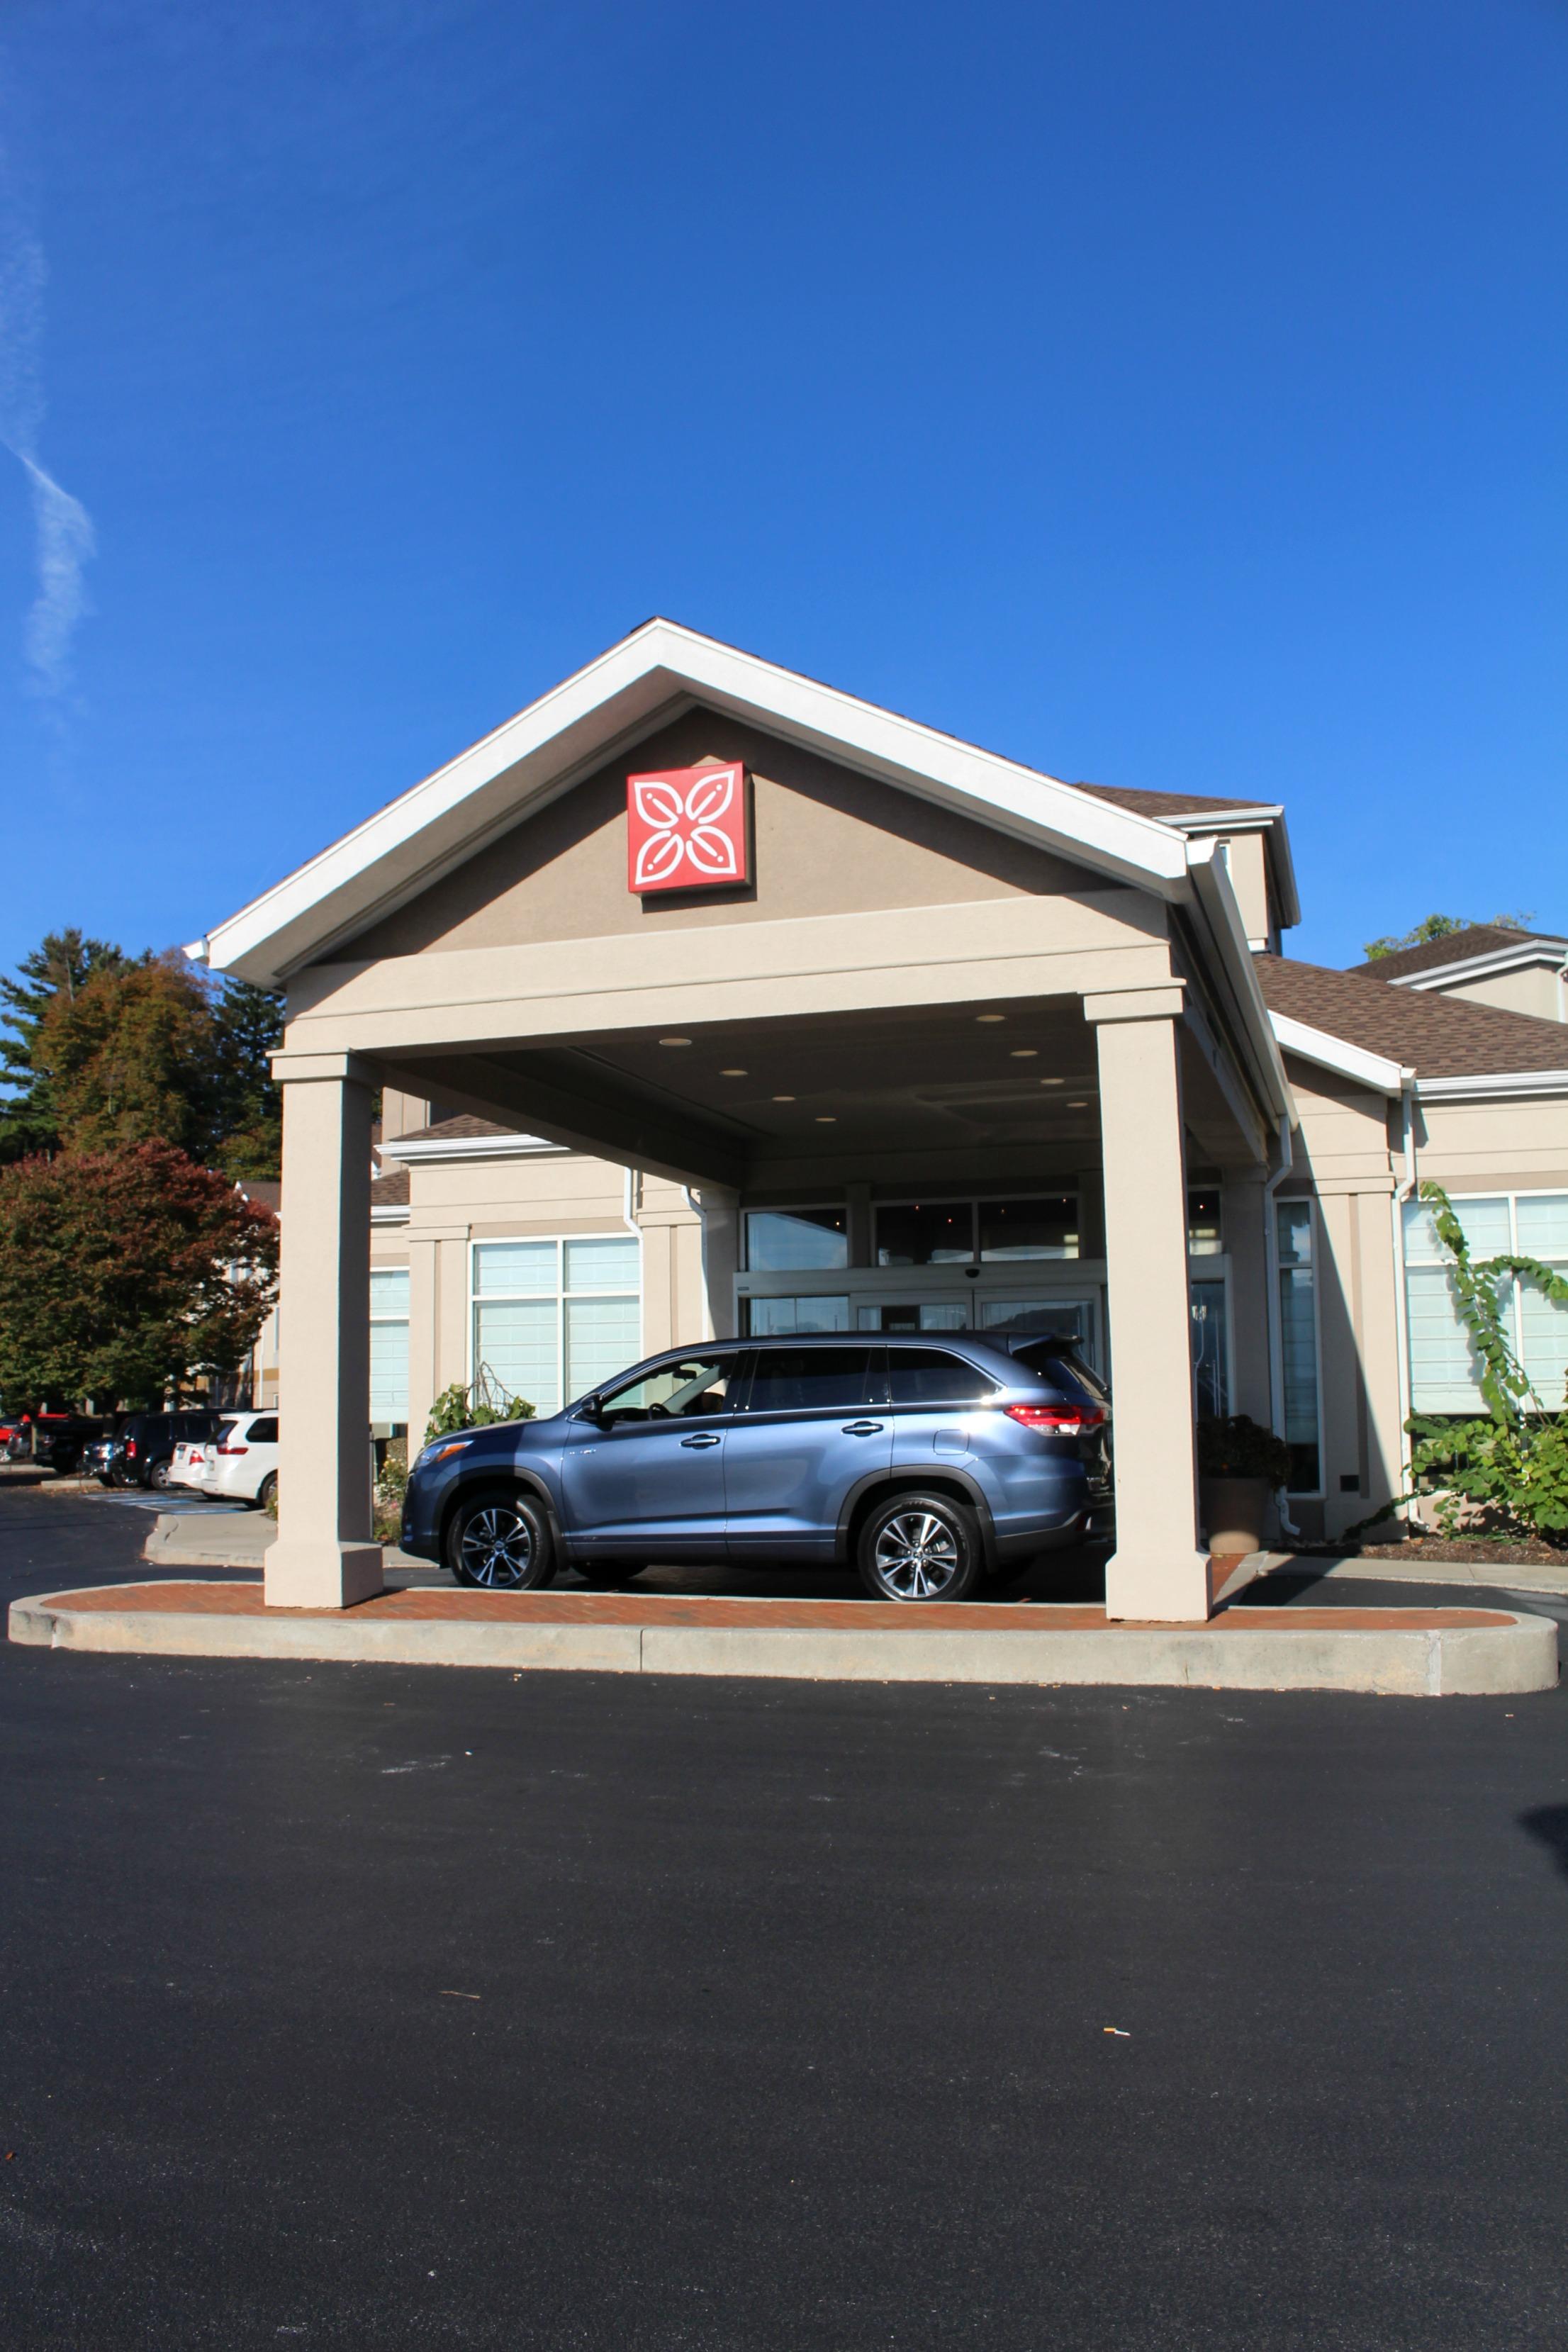 The outside entrance to the Hilton Garden Inn Hershey